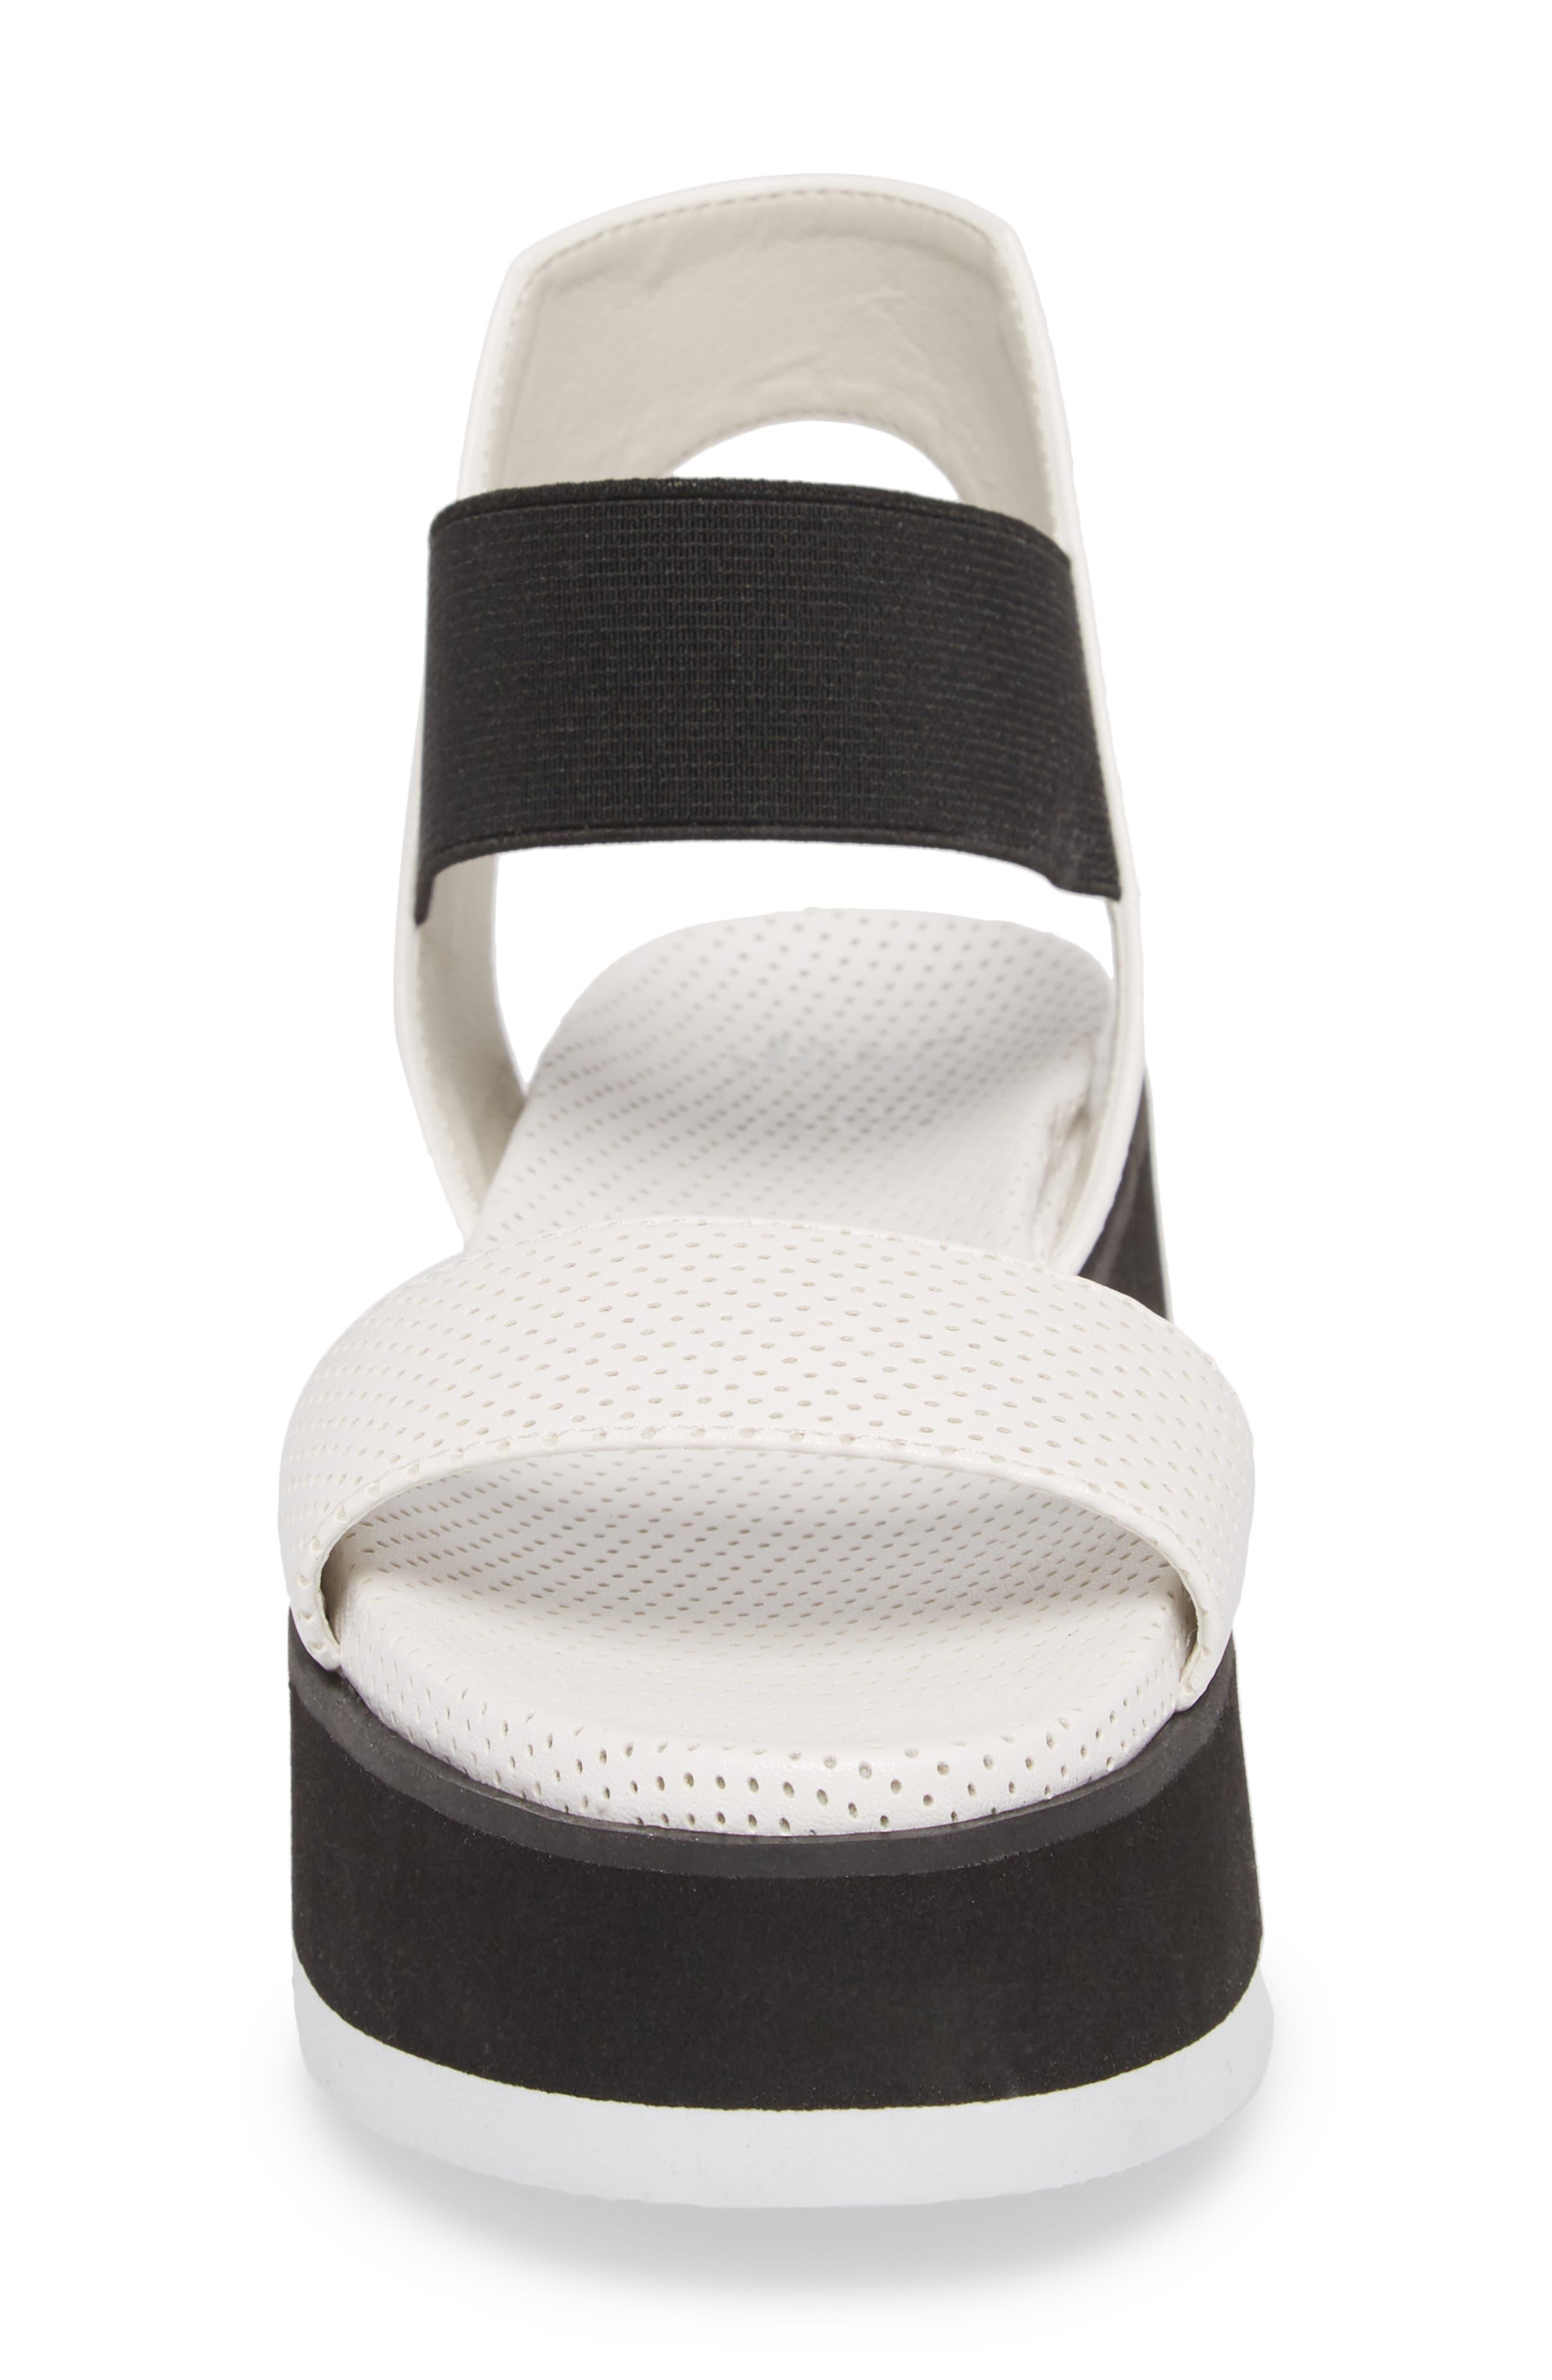 Josie Perforated Platform Sandal,                             Alternate thumbnail 5, color,                             White